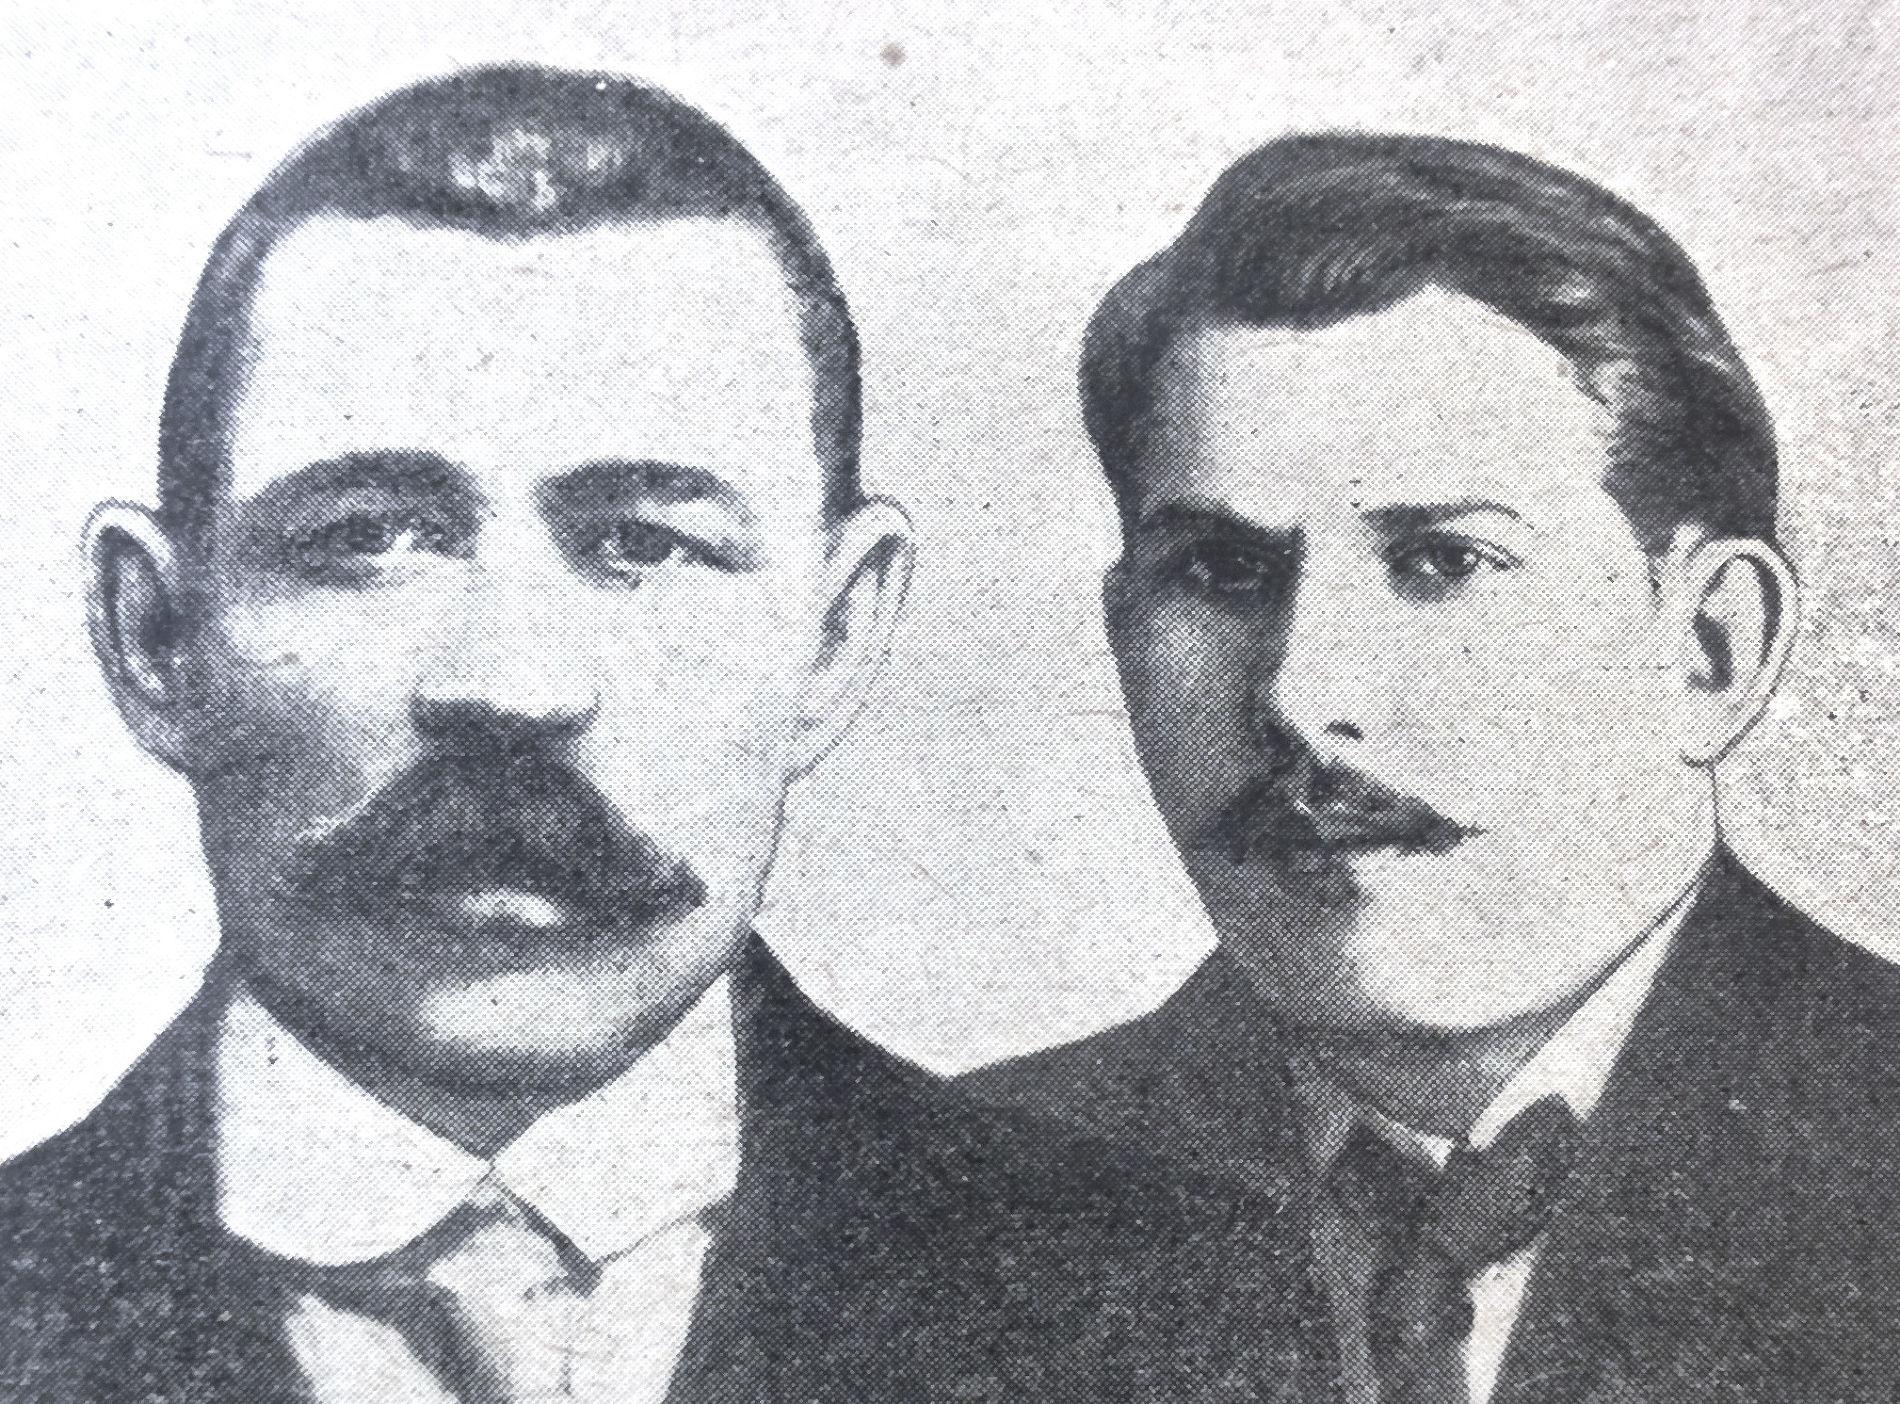 Митрофан и Глеб Седины